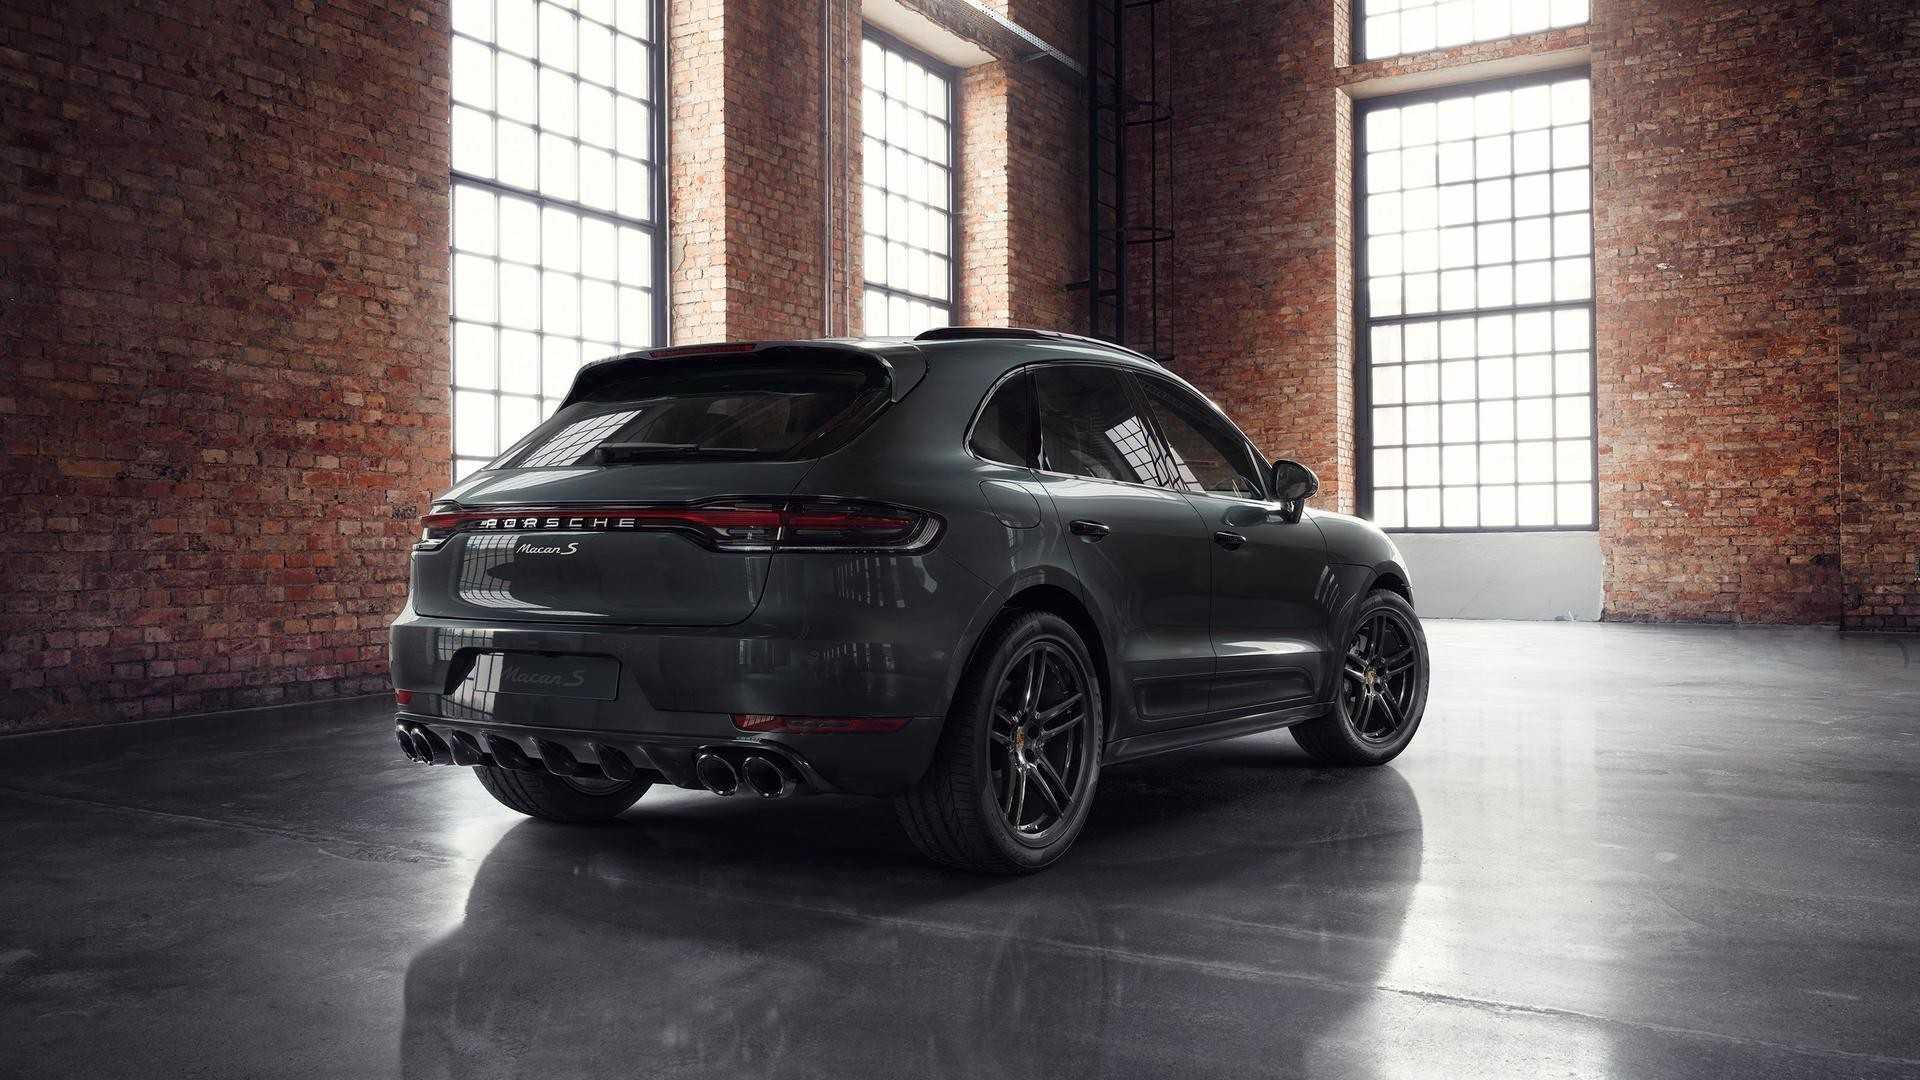 Macan S получил тюнинг от Porsche Exclusive Manufaktur 1